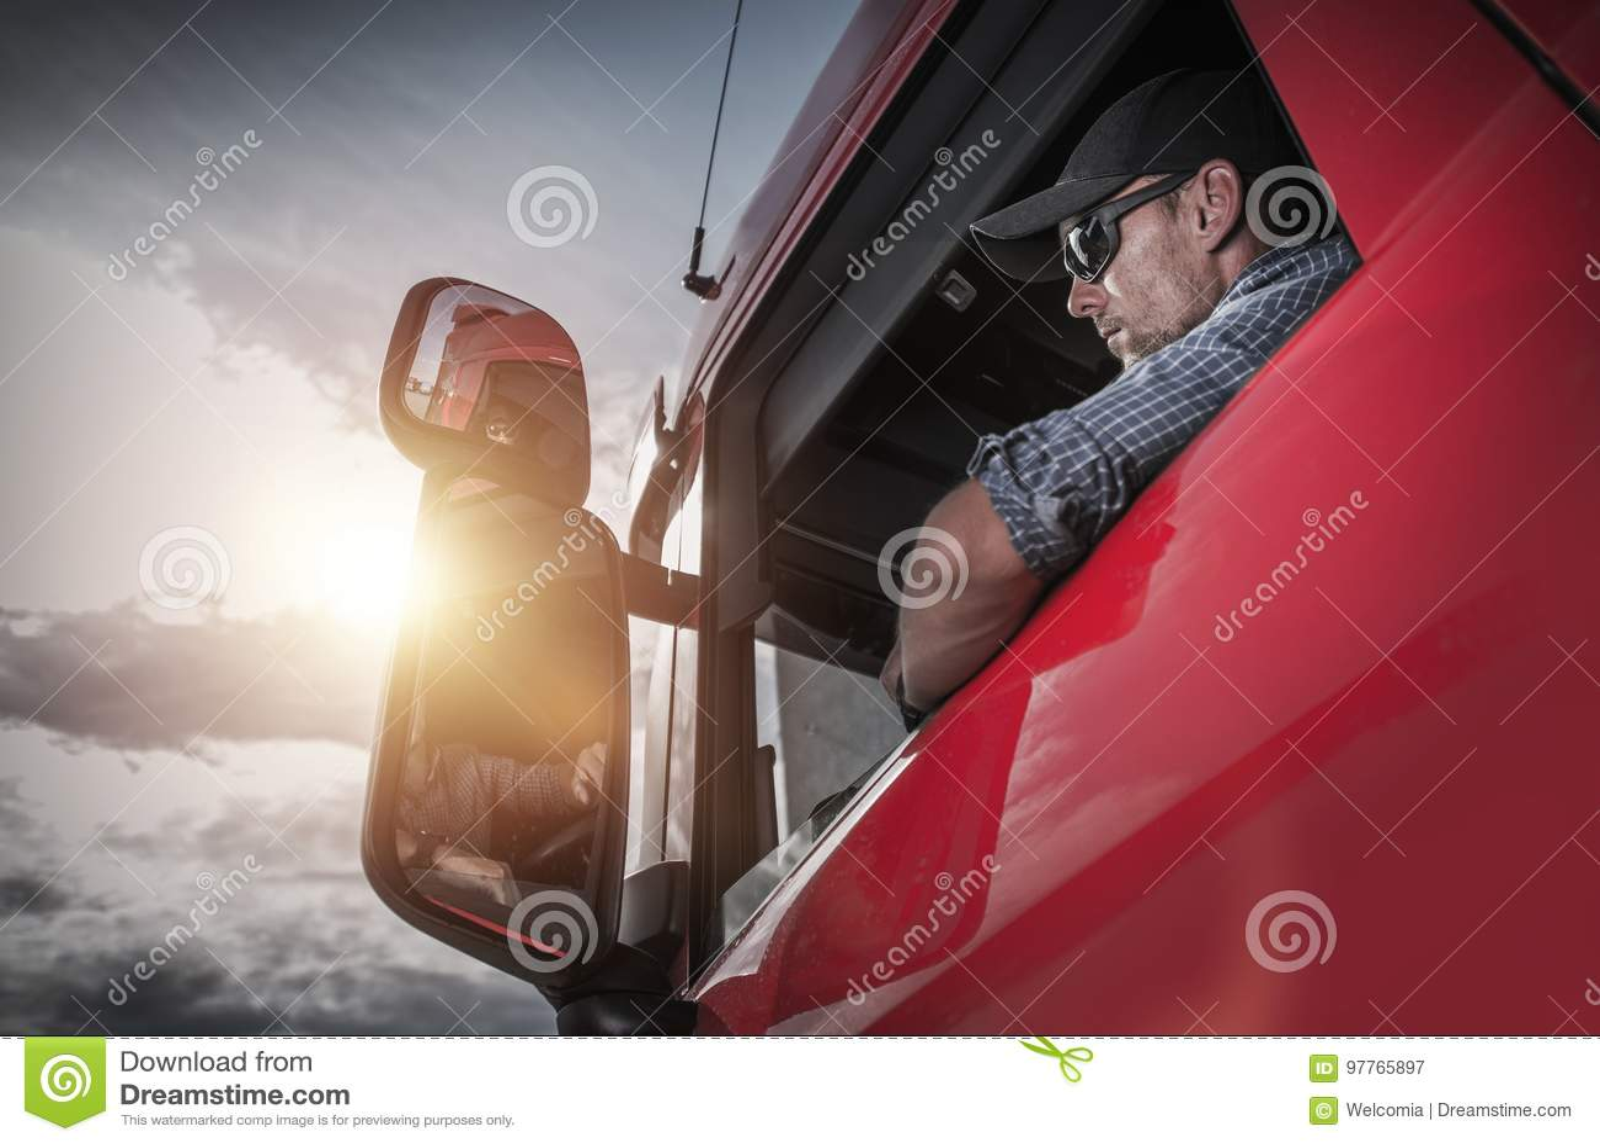 Halv lastbilsförare